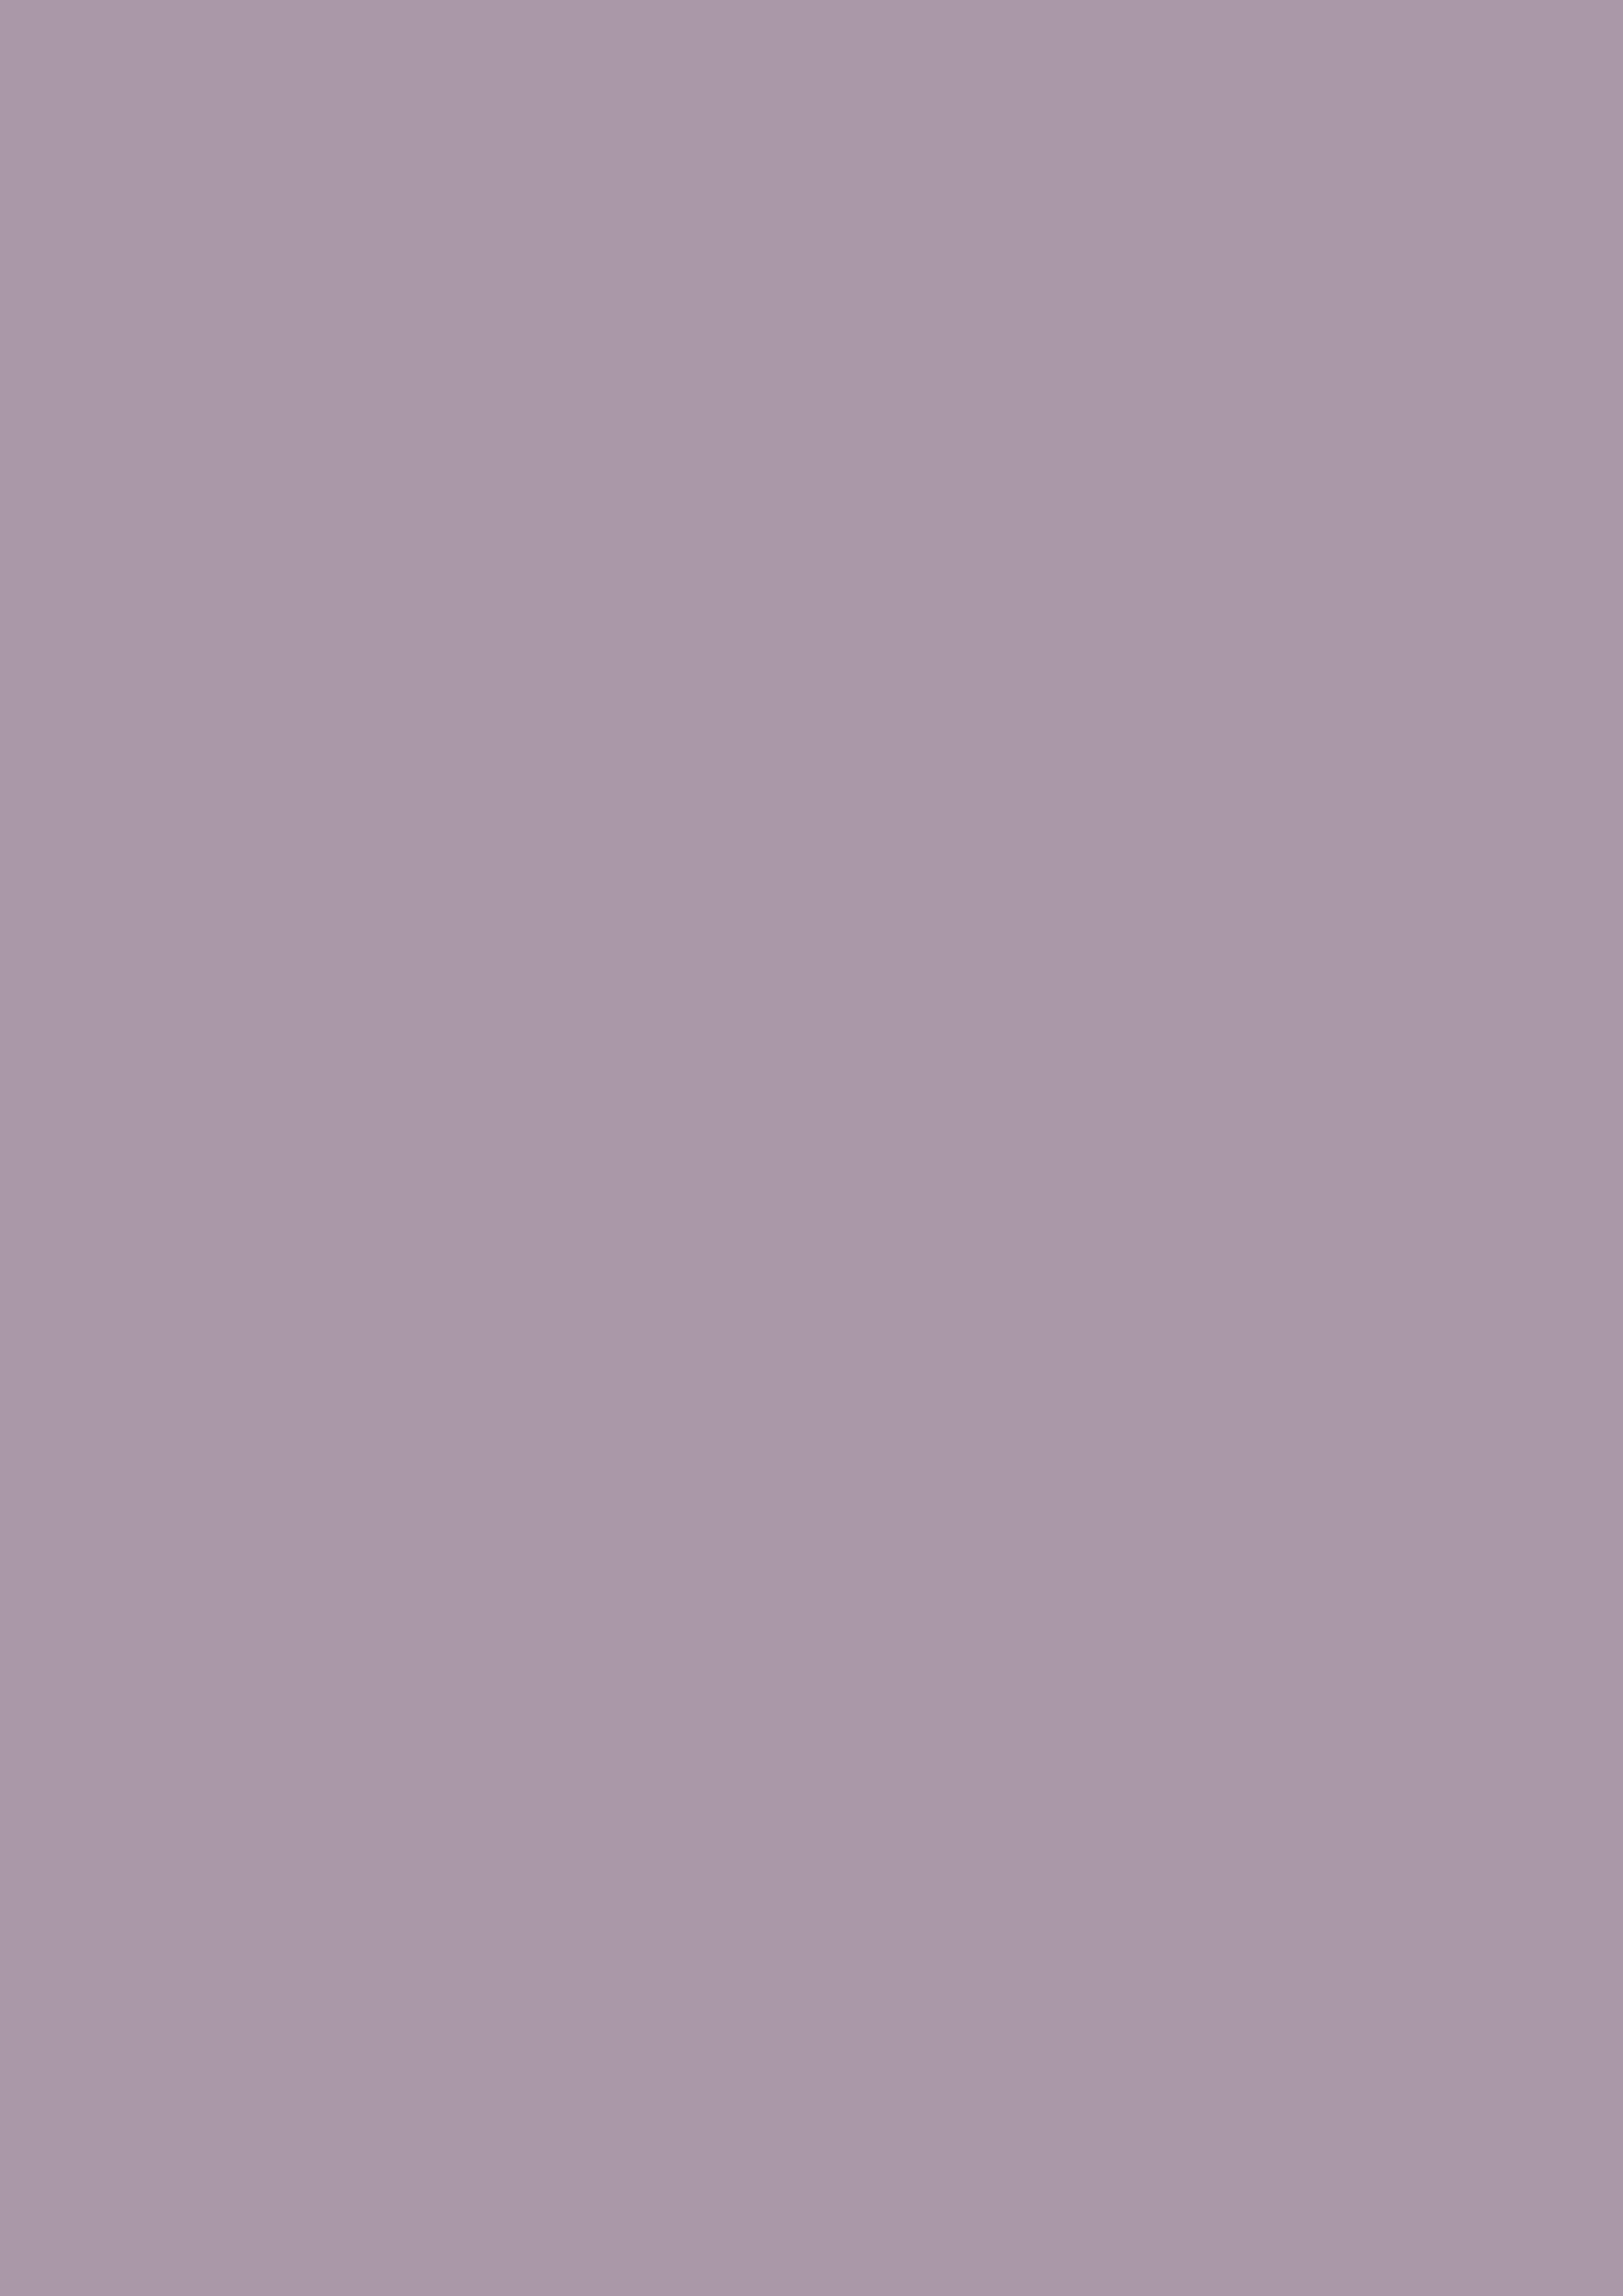 2480x3508 Rose Quartz Solid Color Background